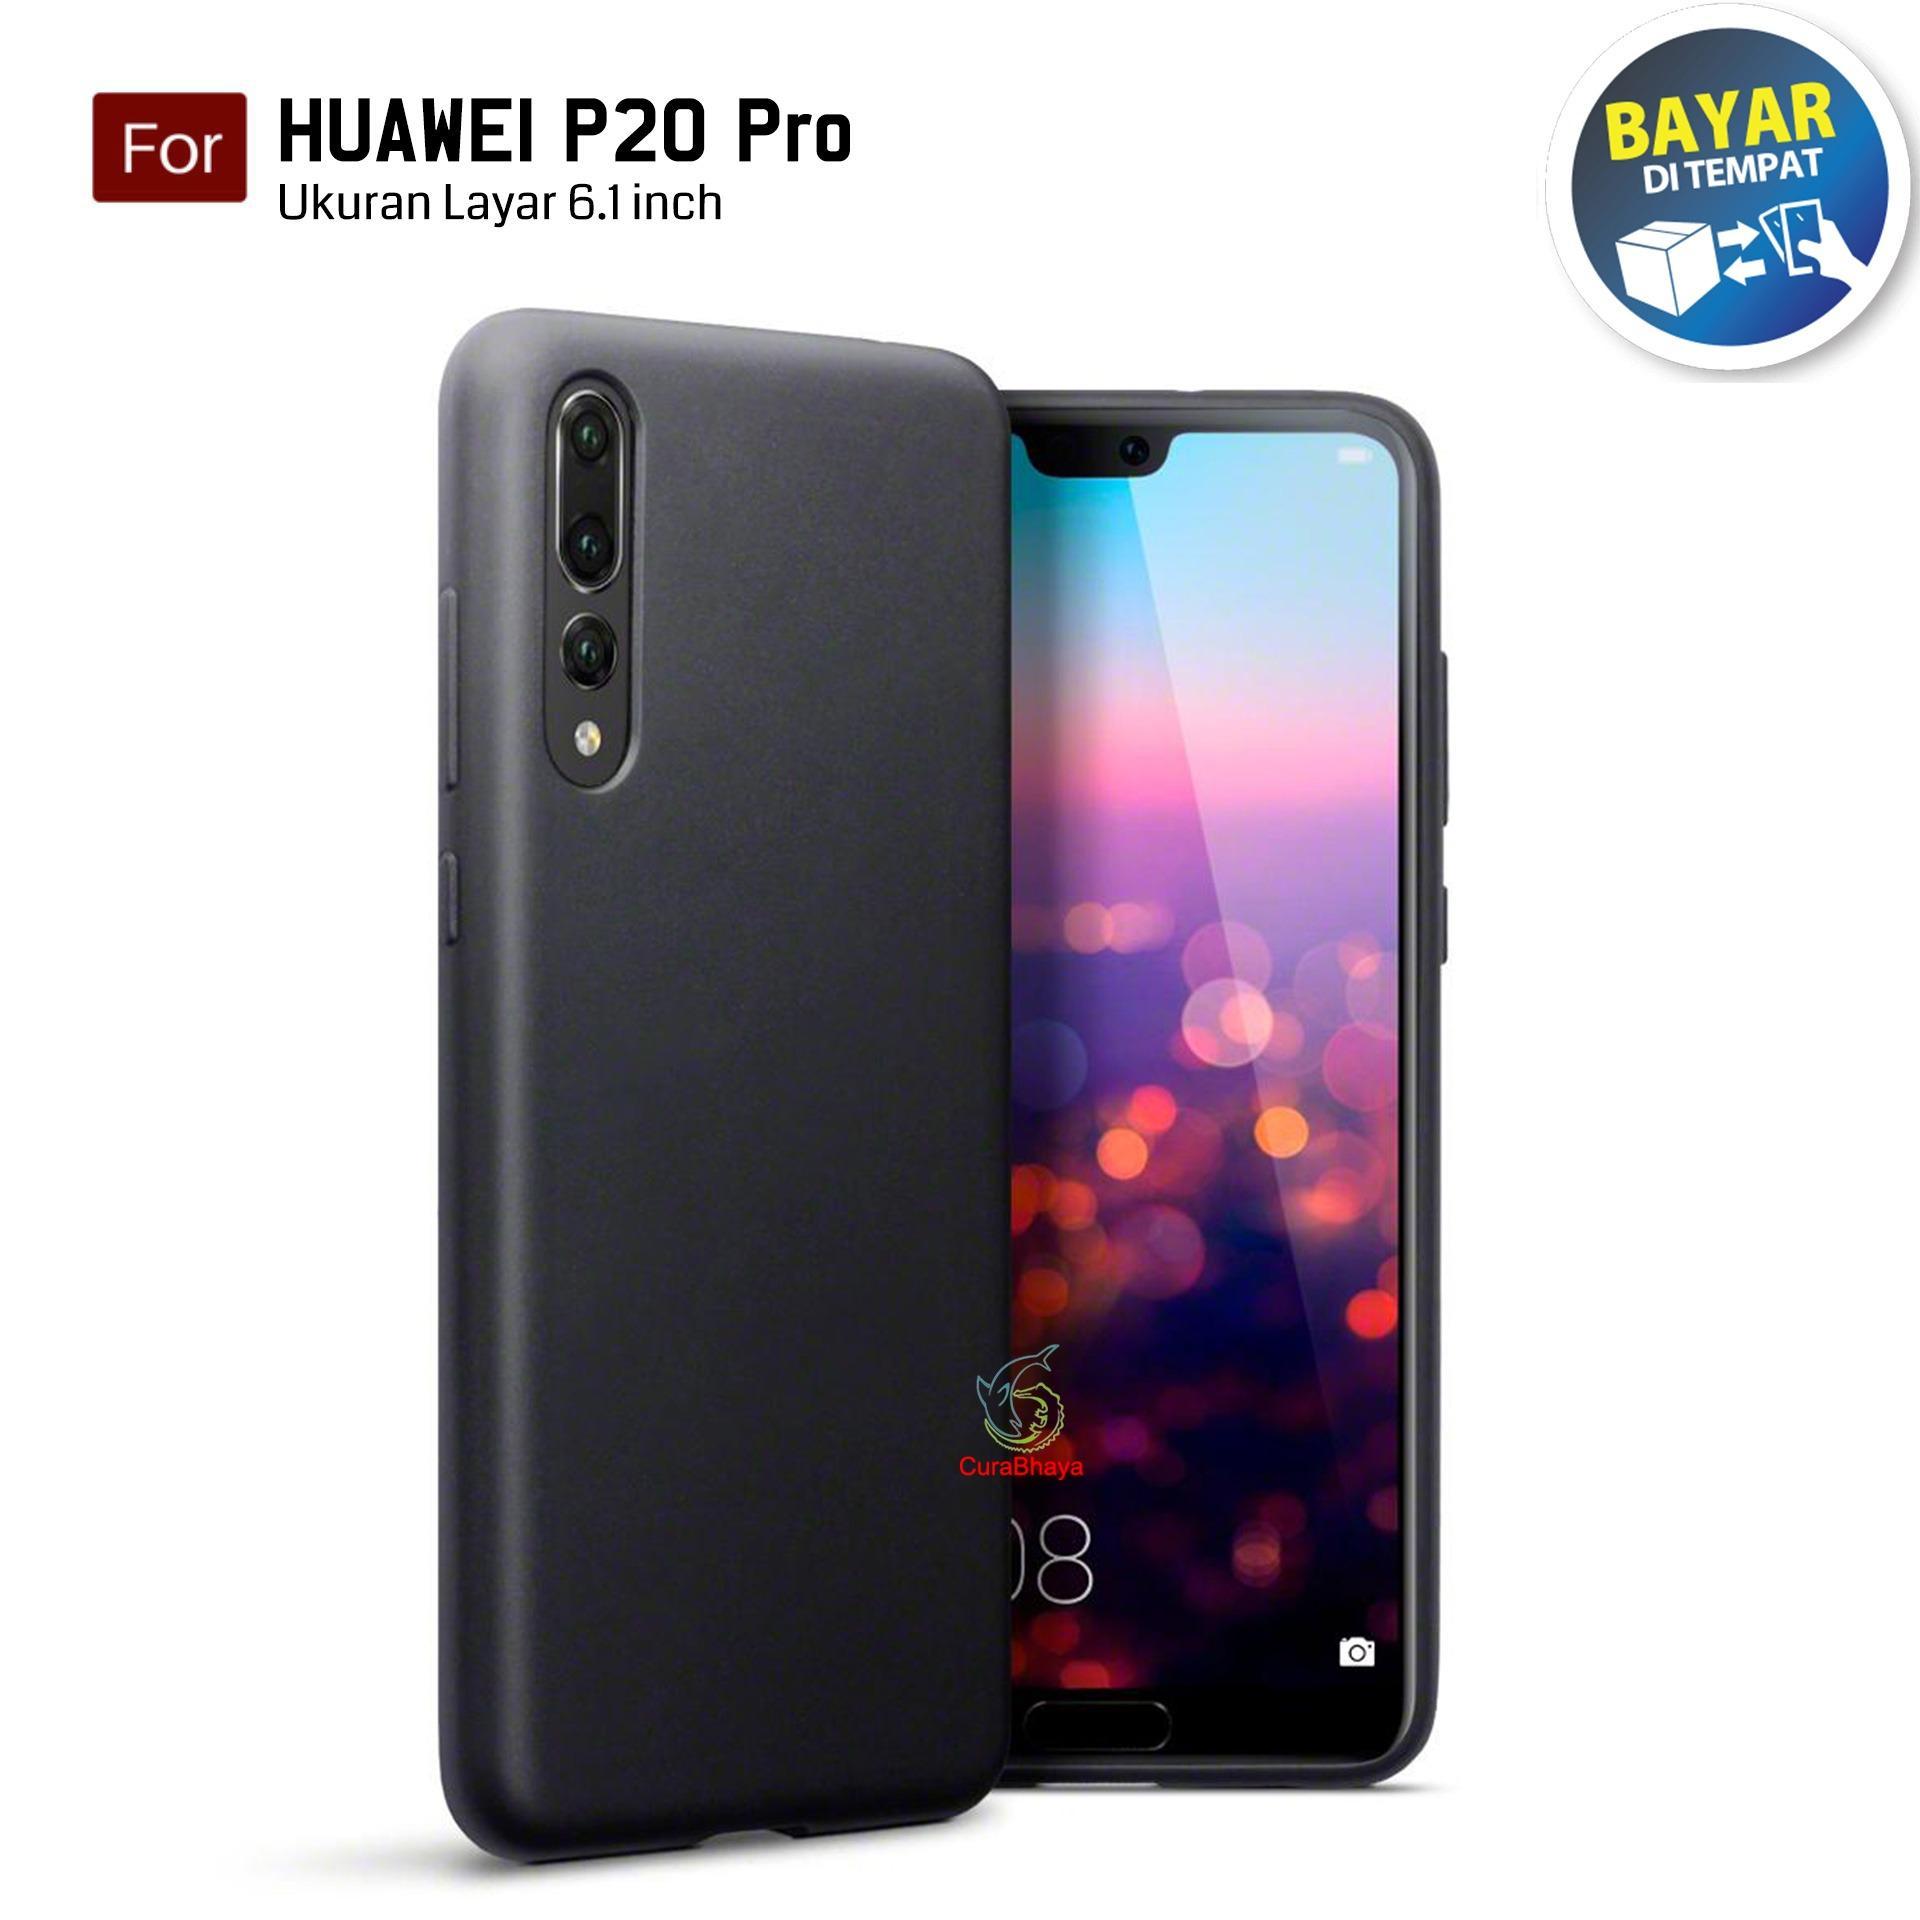 MidNight Huawei P20 Pro | Slim Case Black Matte Softcase Premium Baby Skin - Hitam